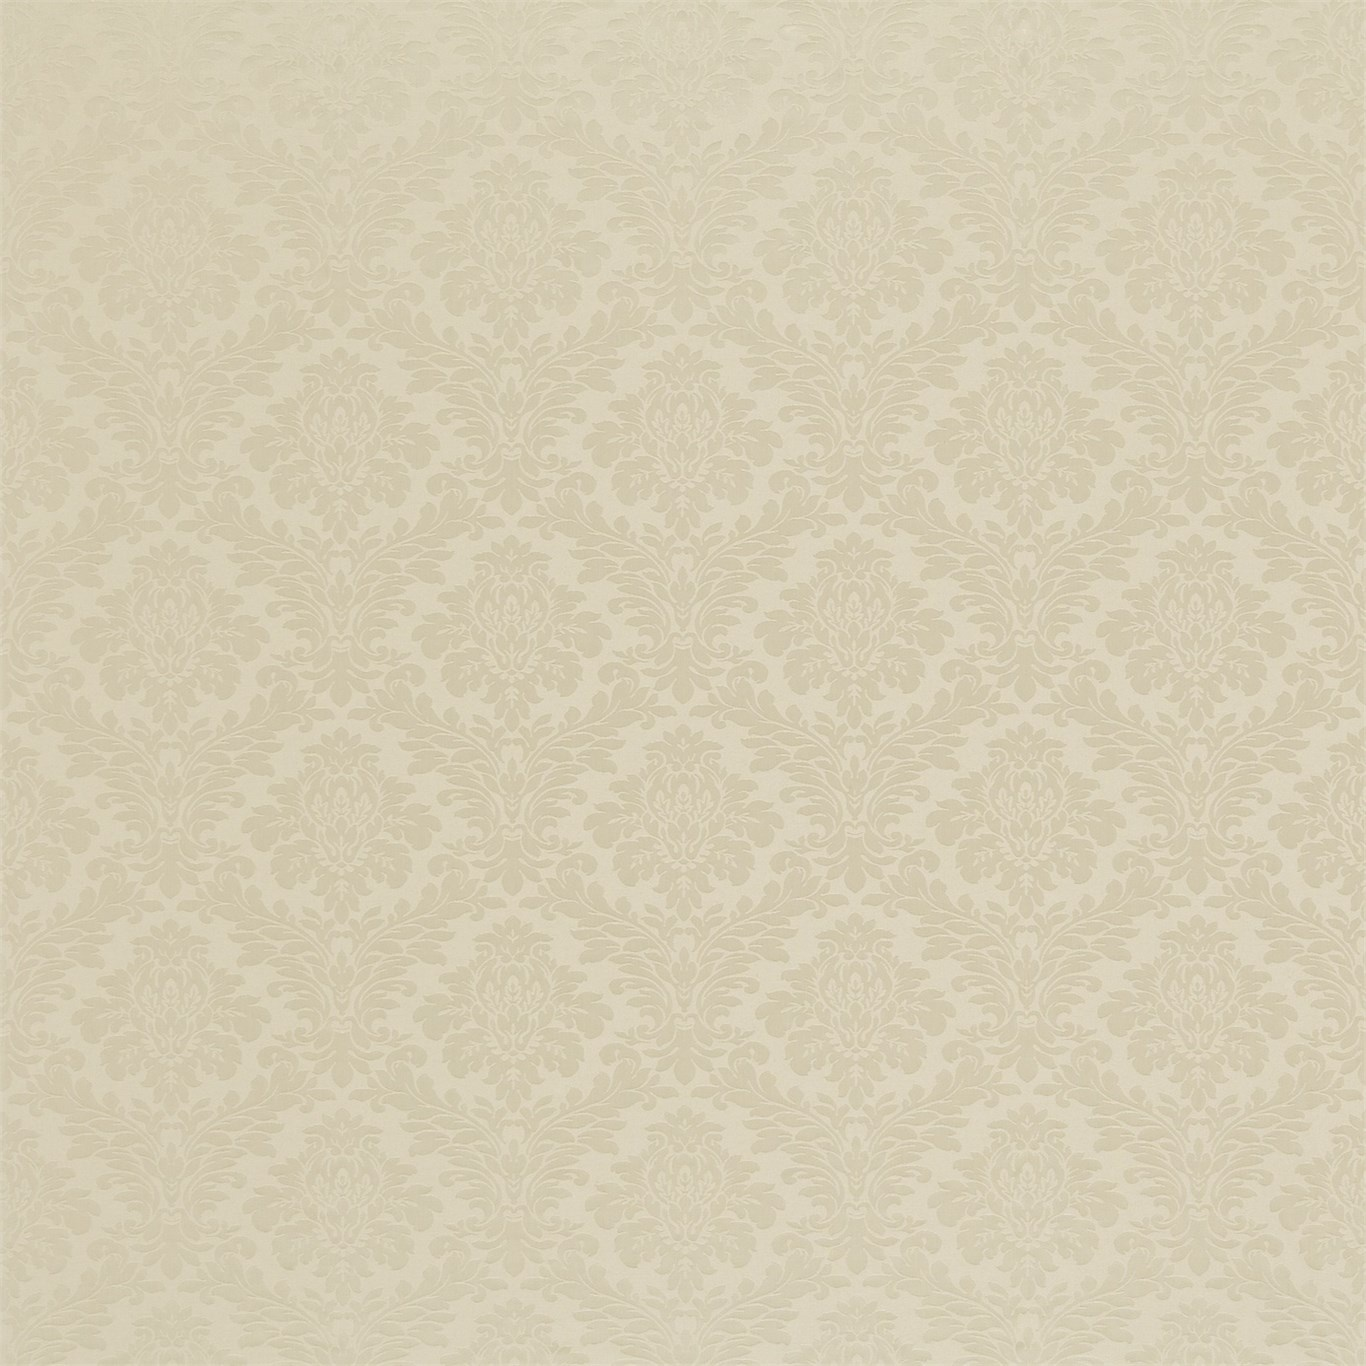 Image of Sanderson Lymington Damask Pale Linen Fabric 232609